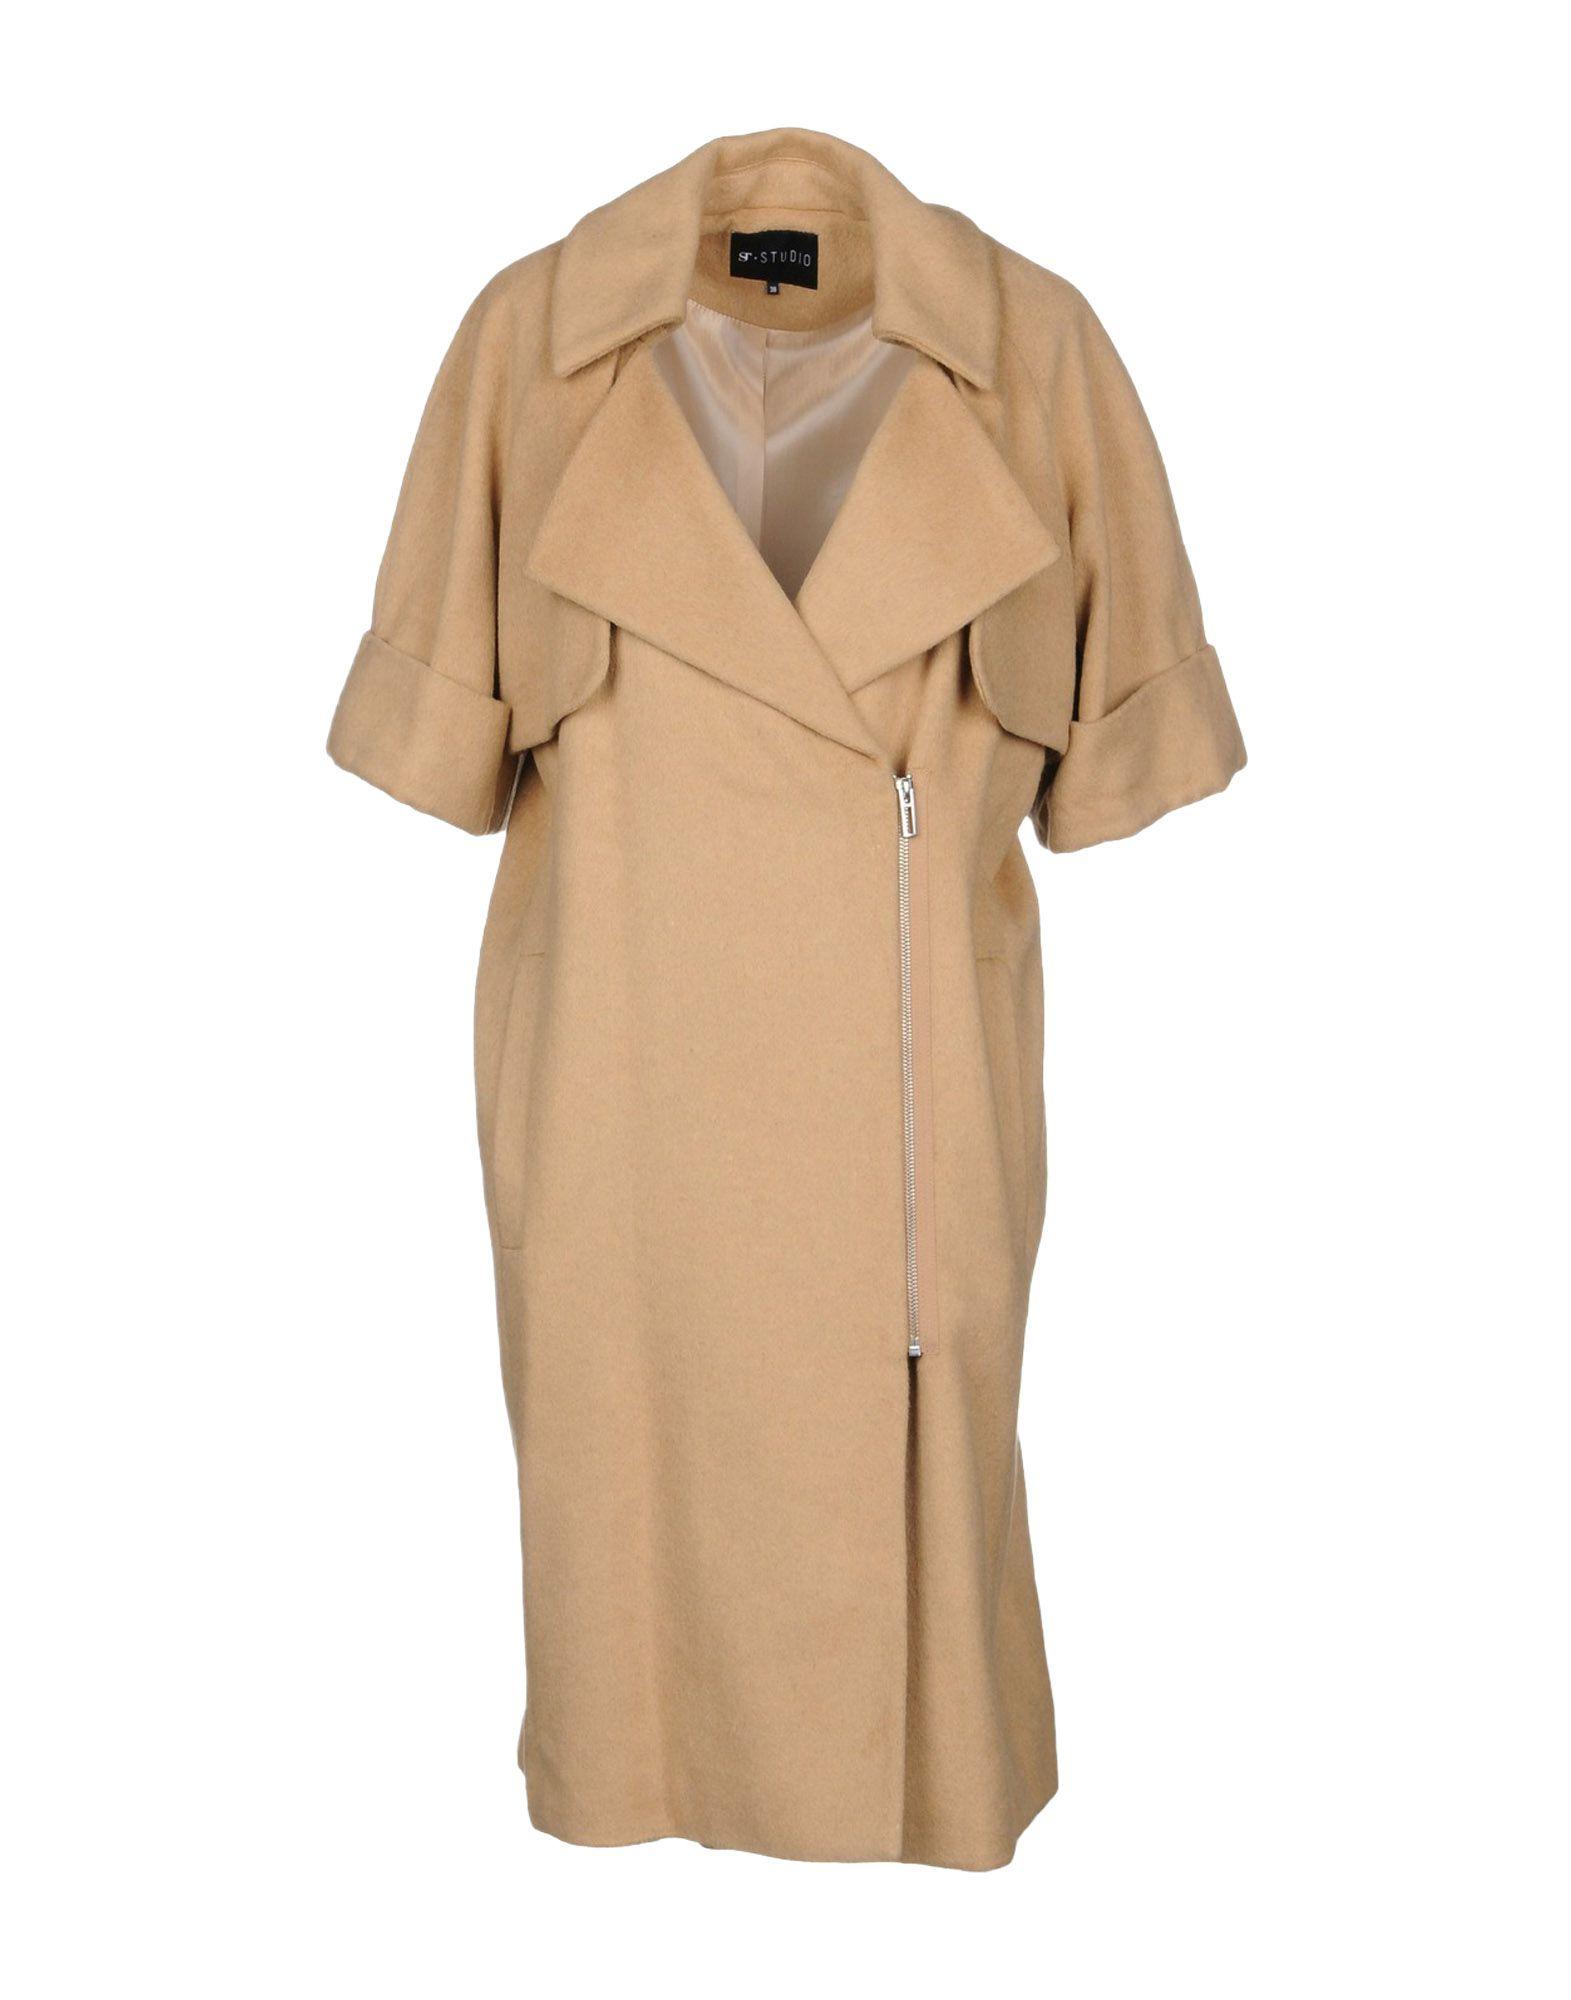 ST. STUDIO Пальто пальто алонзо d'imma fashion studio